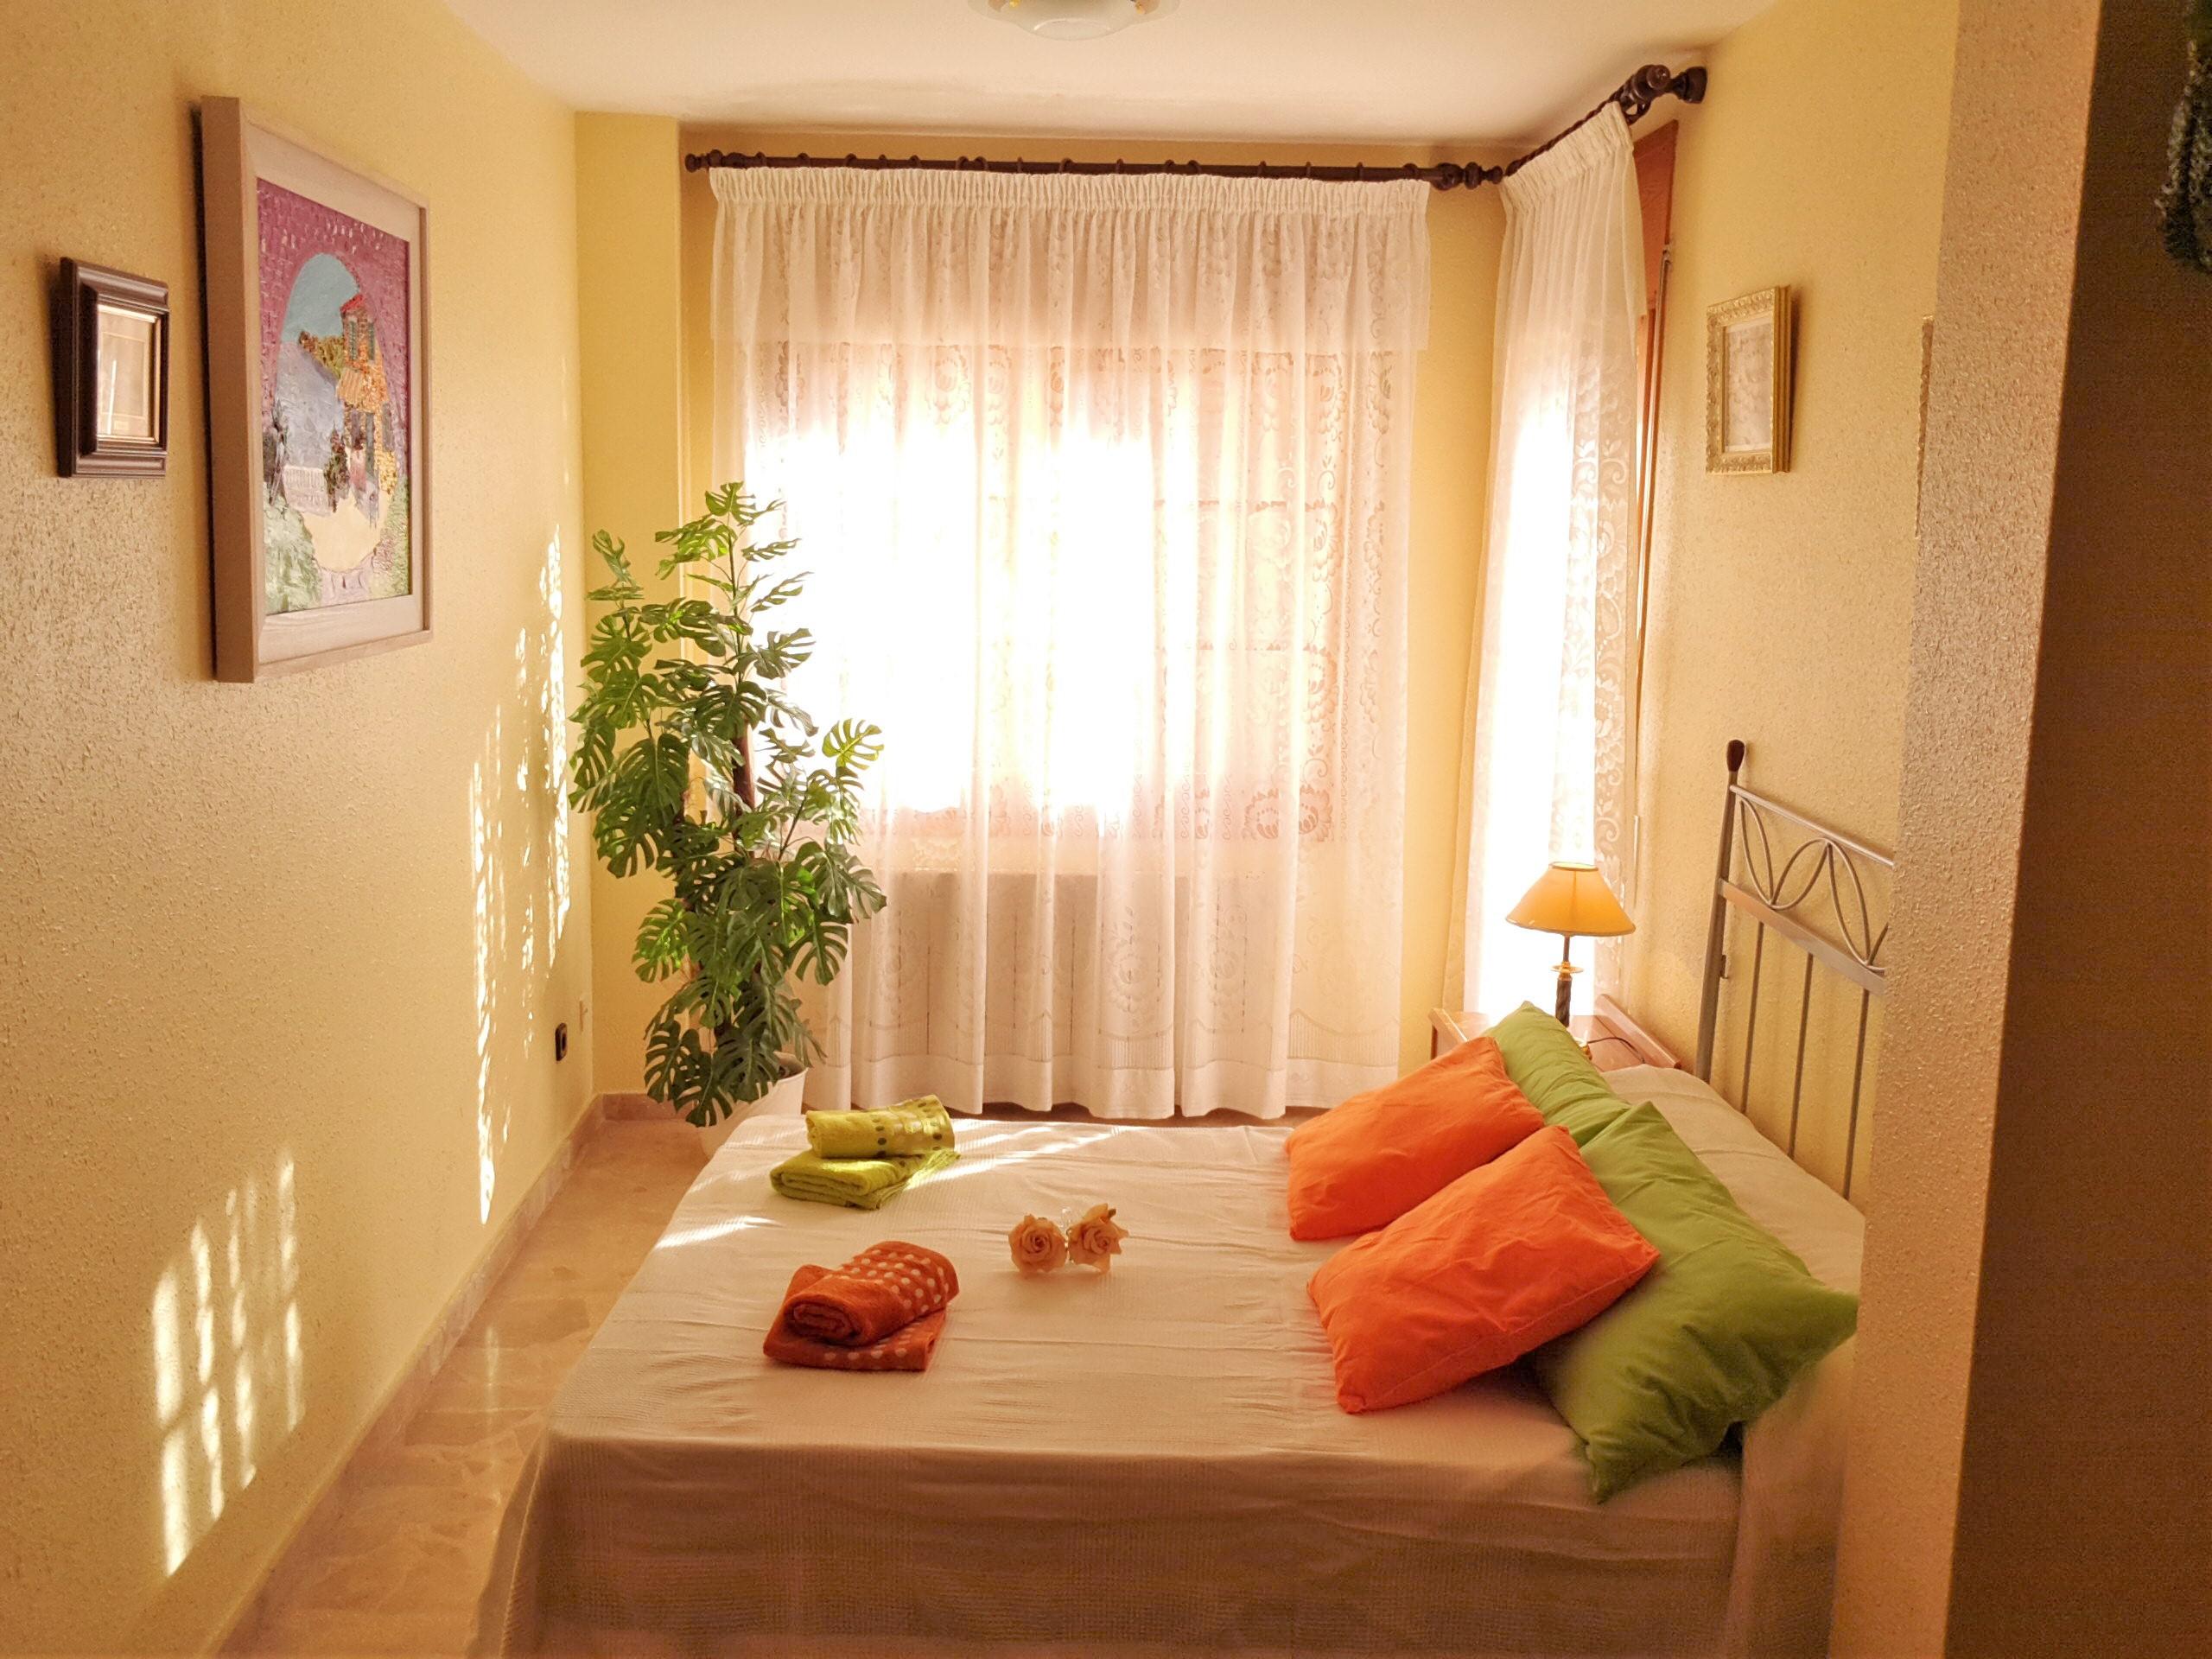 dormitorio III: cama doble